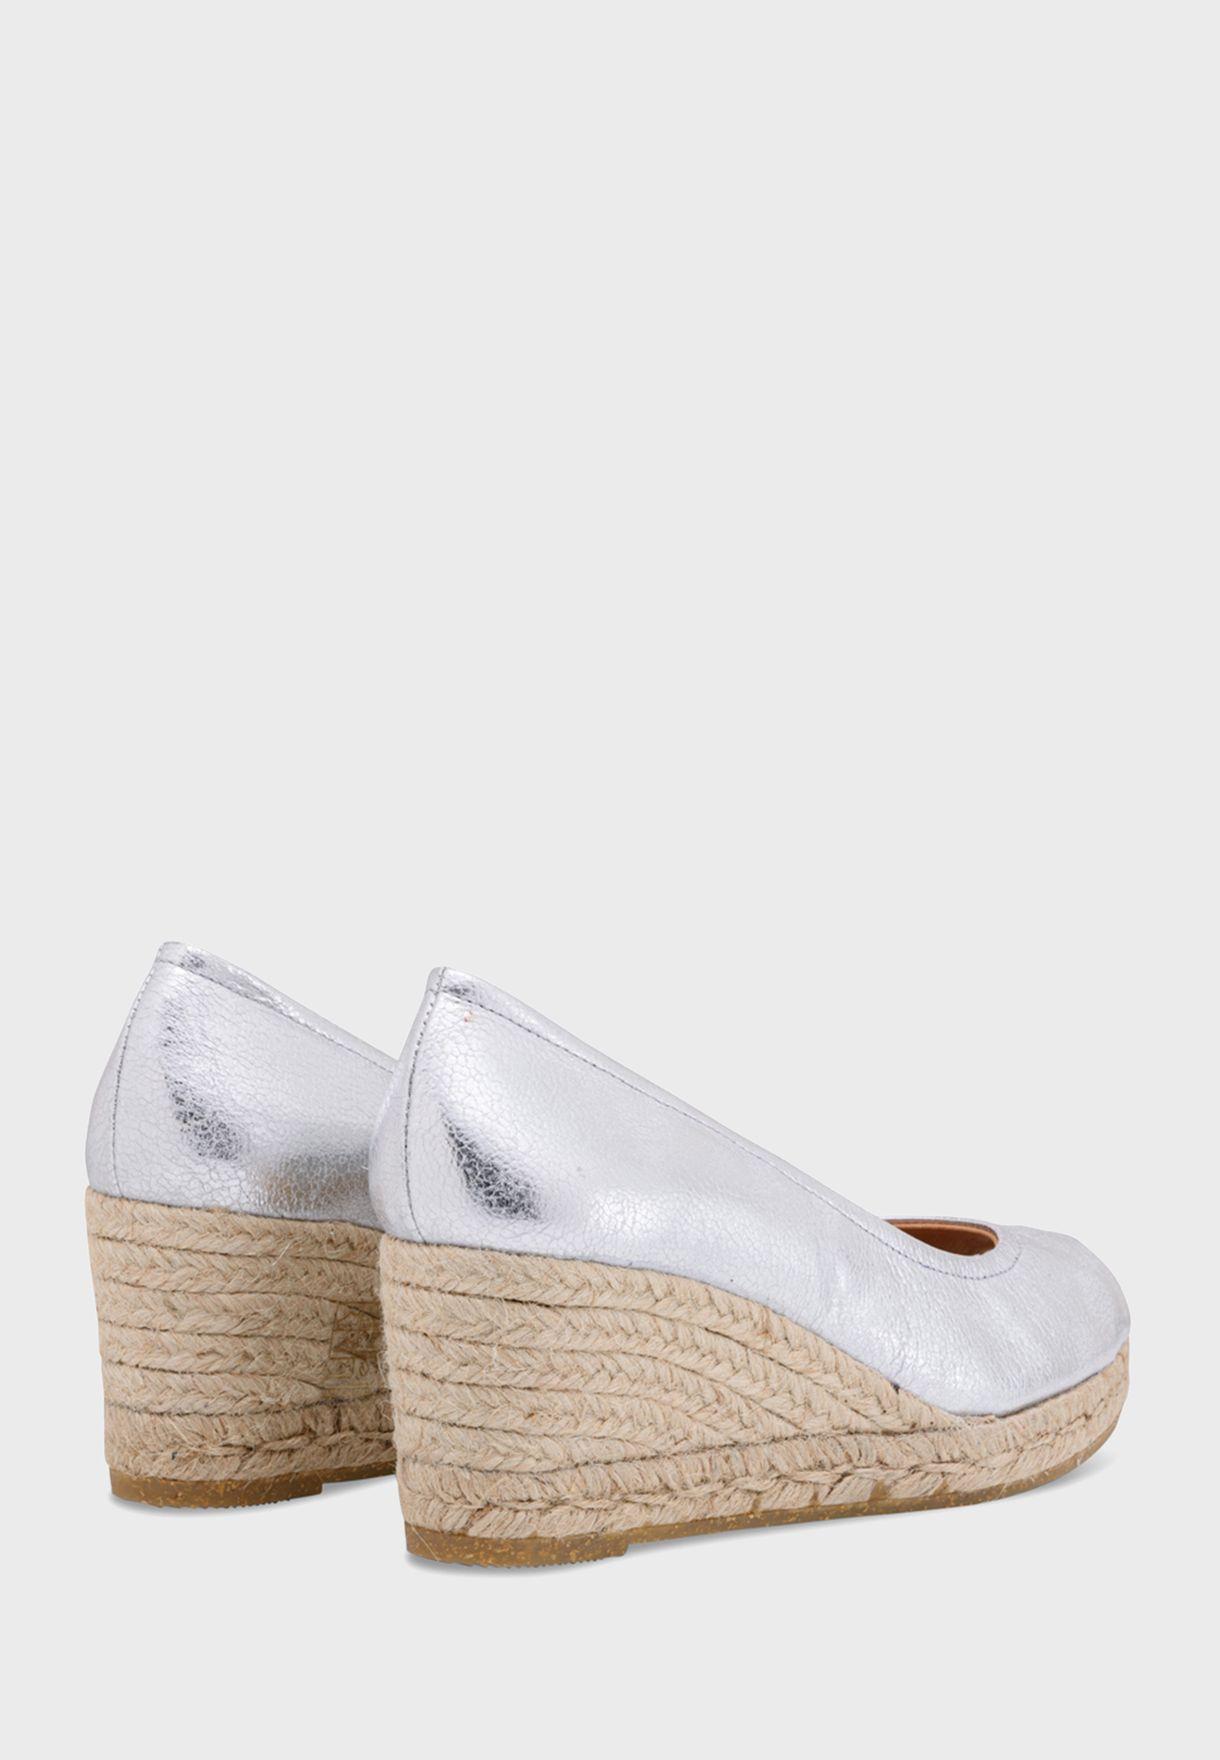 Casual High Heel Wedge Sandals